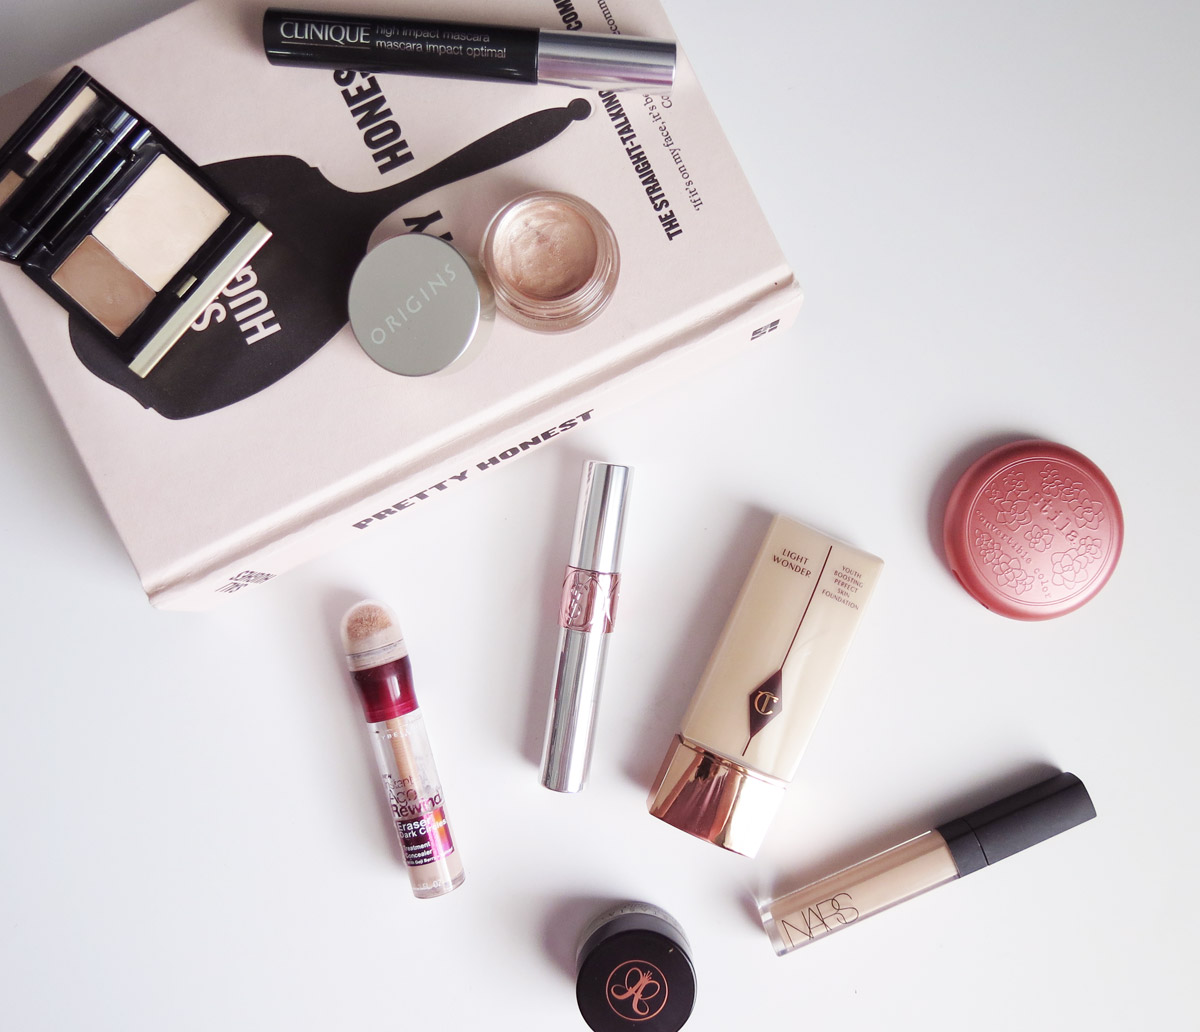 kelseybeauty-makeup-lately-kevyn-aucoin-maybelline-origins-clinique-charlotte-tilbury-ysl.jpg